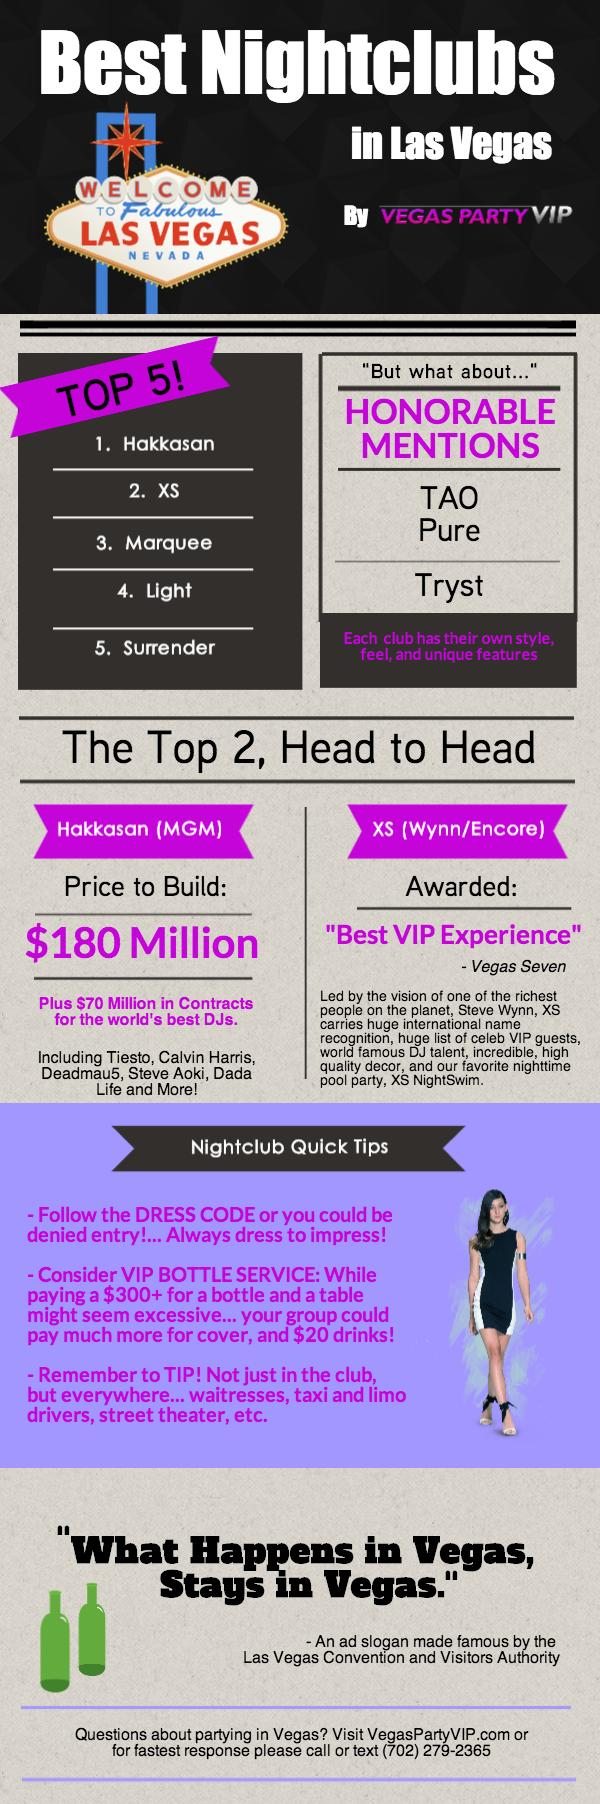 Top Nightclubs in Las Vegas 2014 Infographic